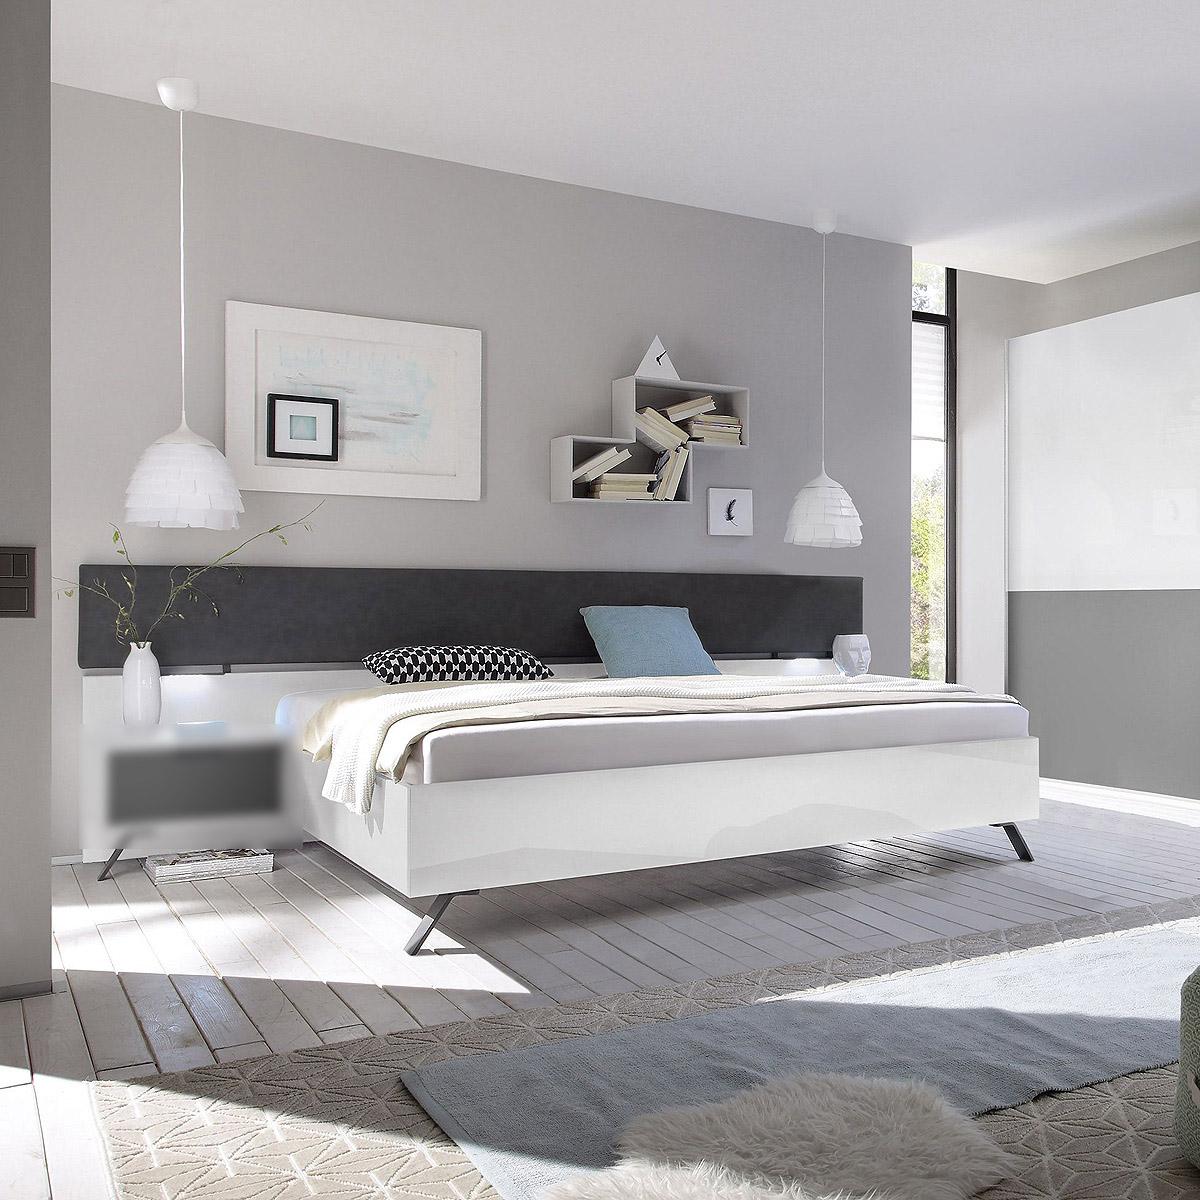 bett matchs schlafzimmerbett doppelbett wei hochglanz anthrazit matt lack 180 ebay. Black Bedroom Furniture Sets. Home Design Ideas